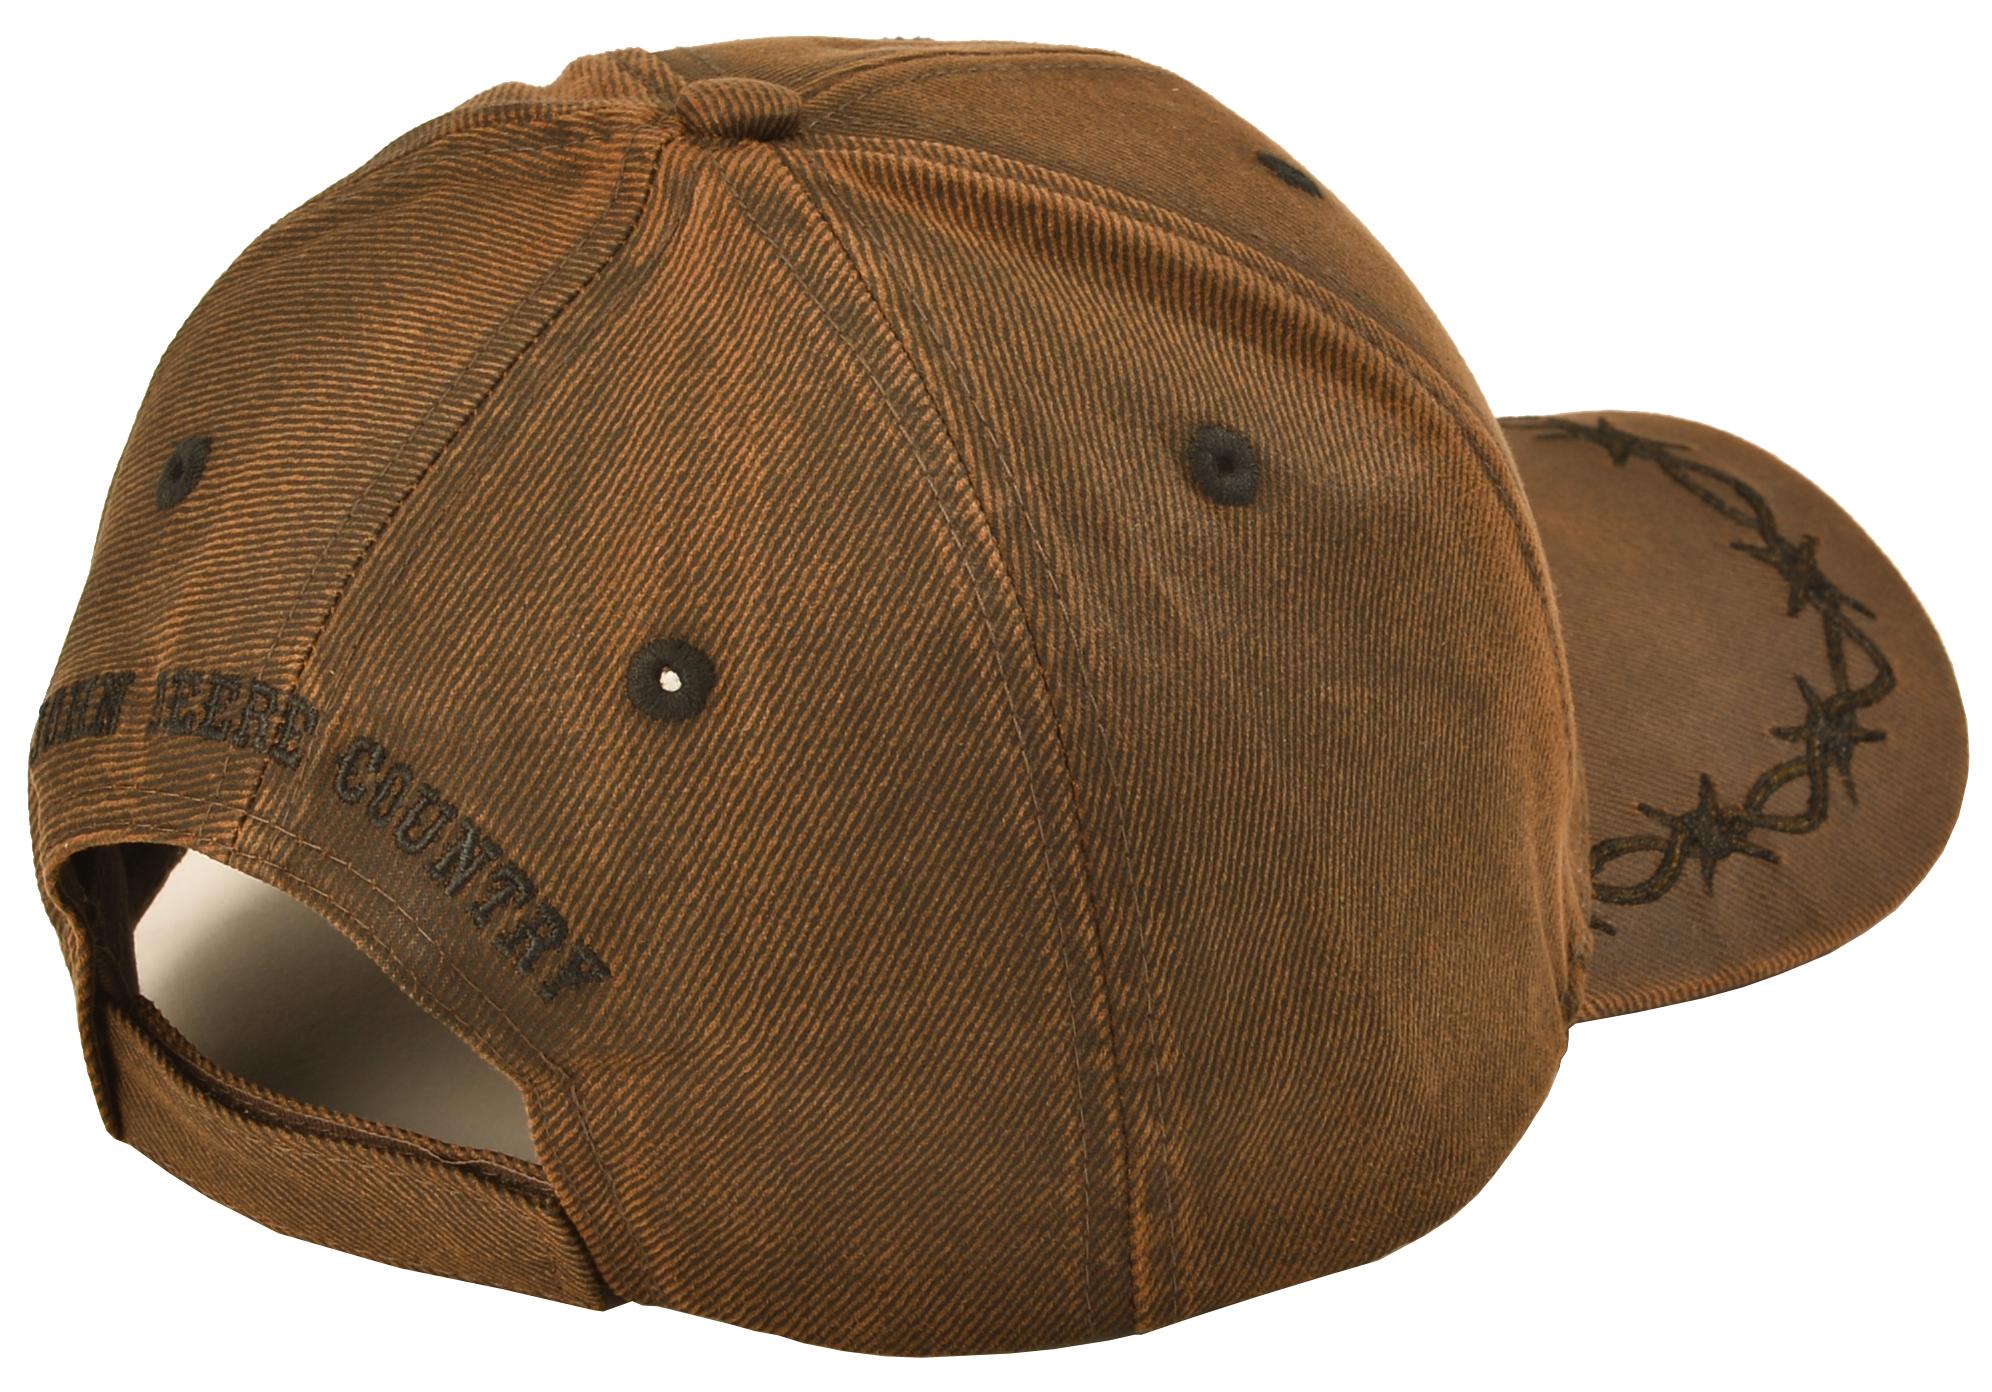 3c0e1f60293 John Deere Oilskin Look Patch Casual Cap